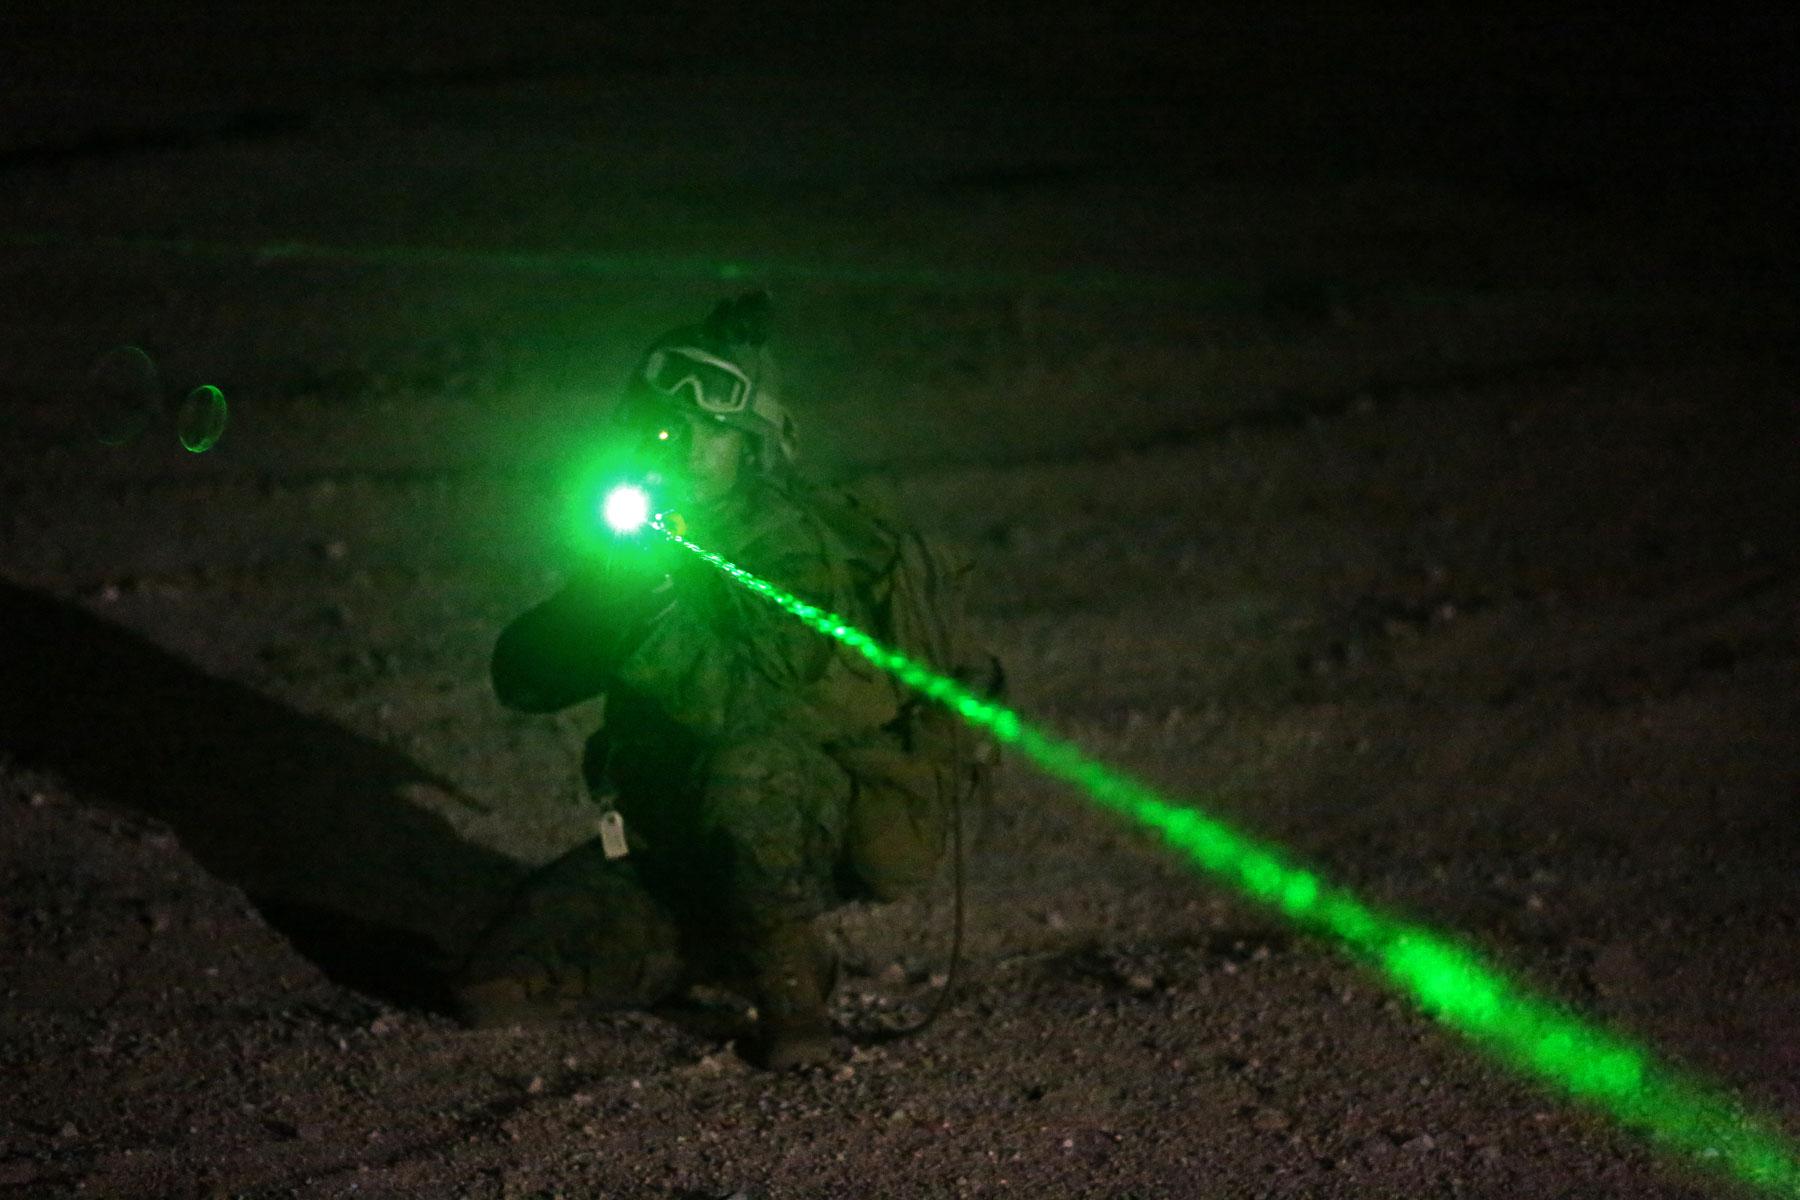 Marines Want CrowdControl Laser